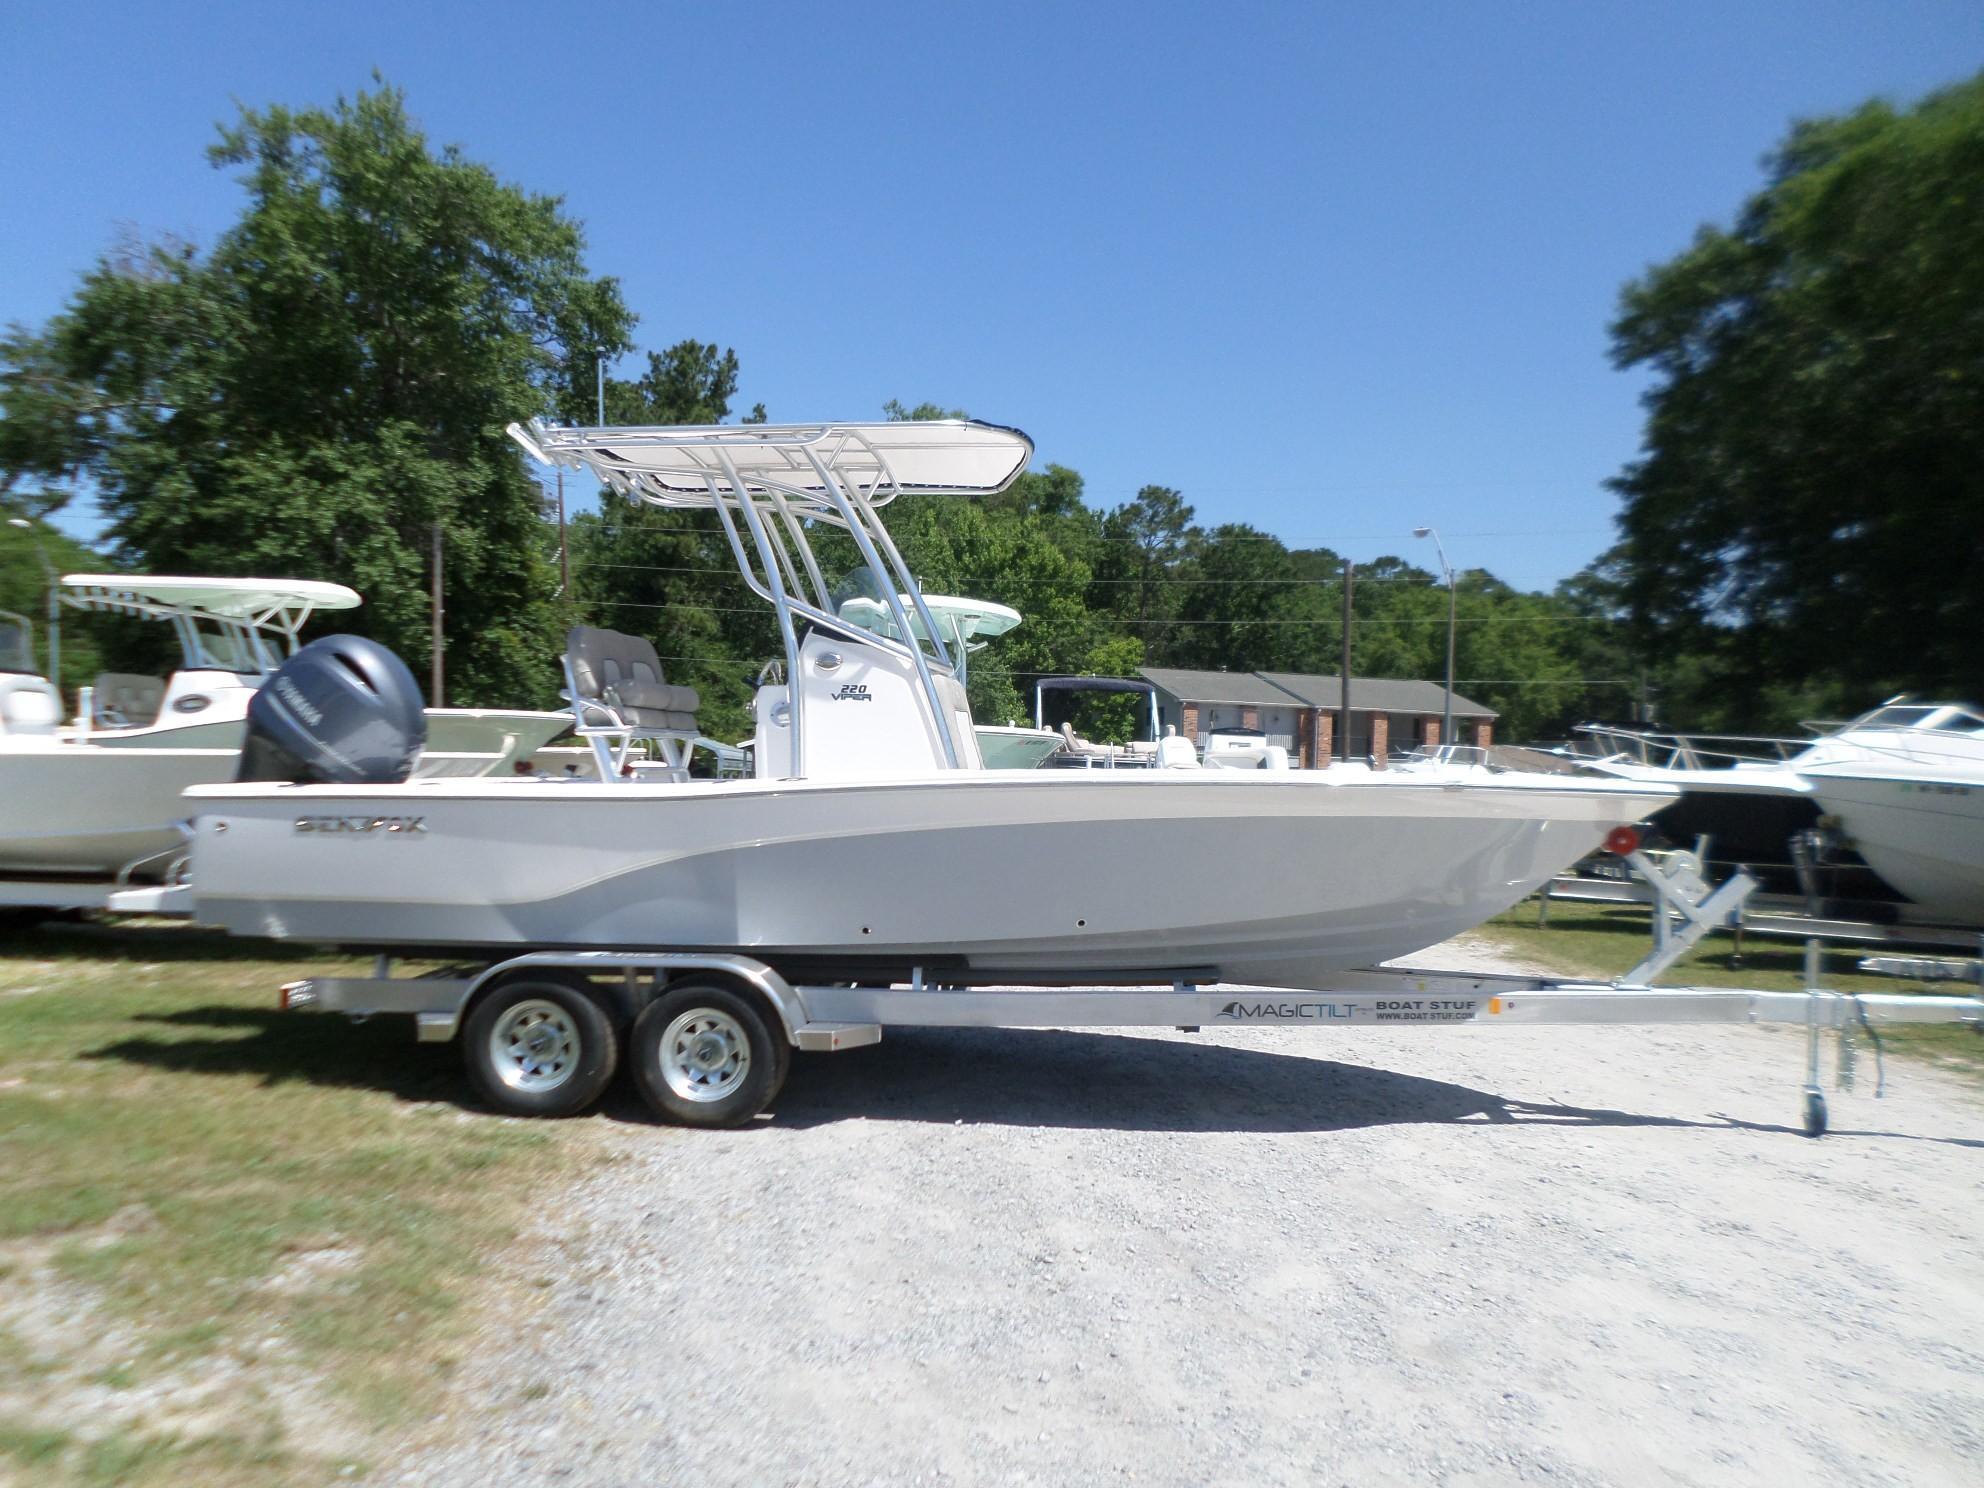 New  2018 22.33' Sea Fox 220 Viper Bay Boat in Slidell, Louisiana